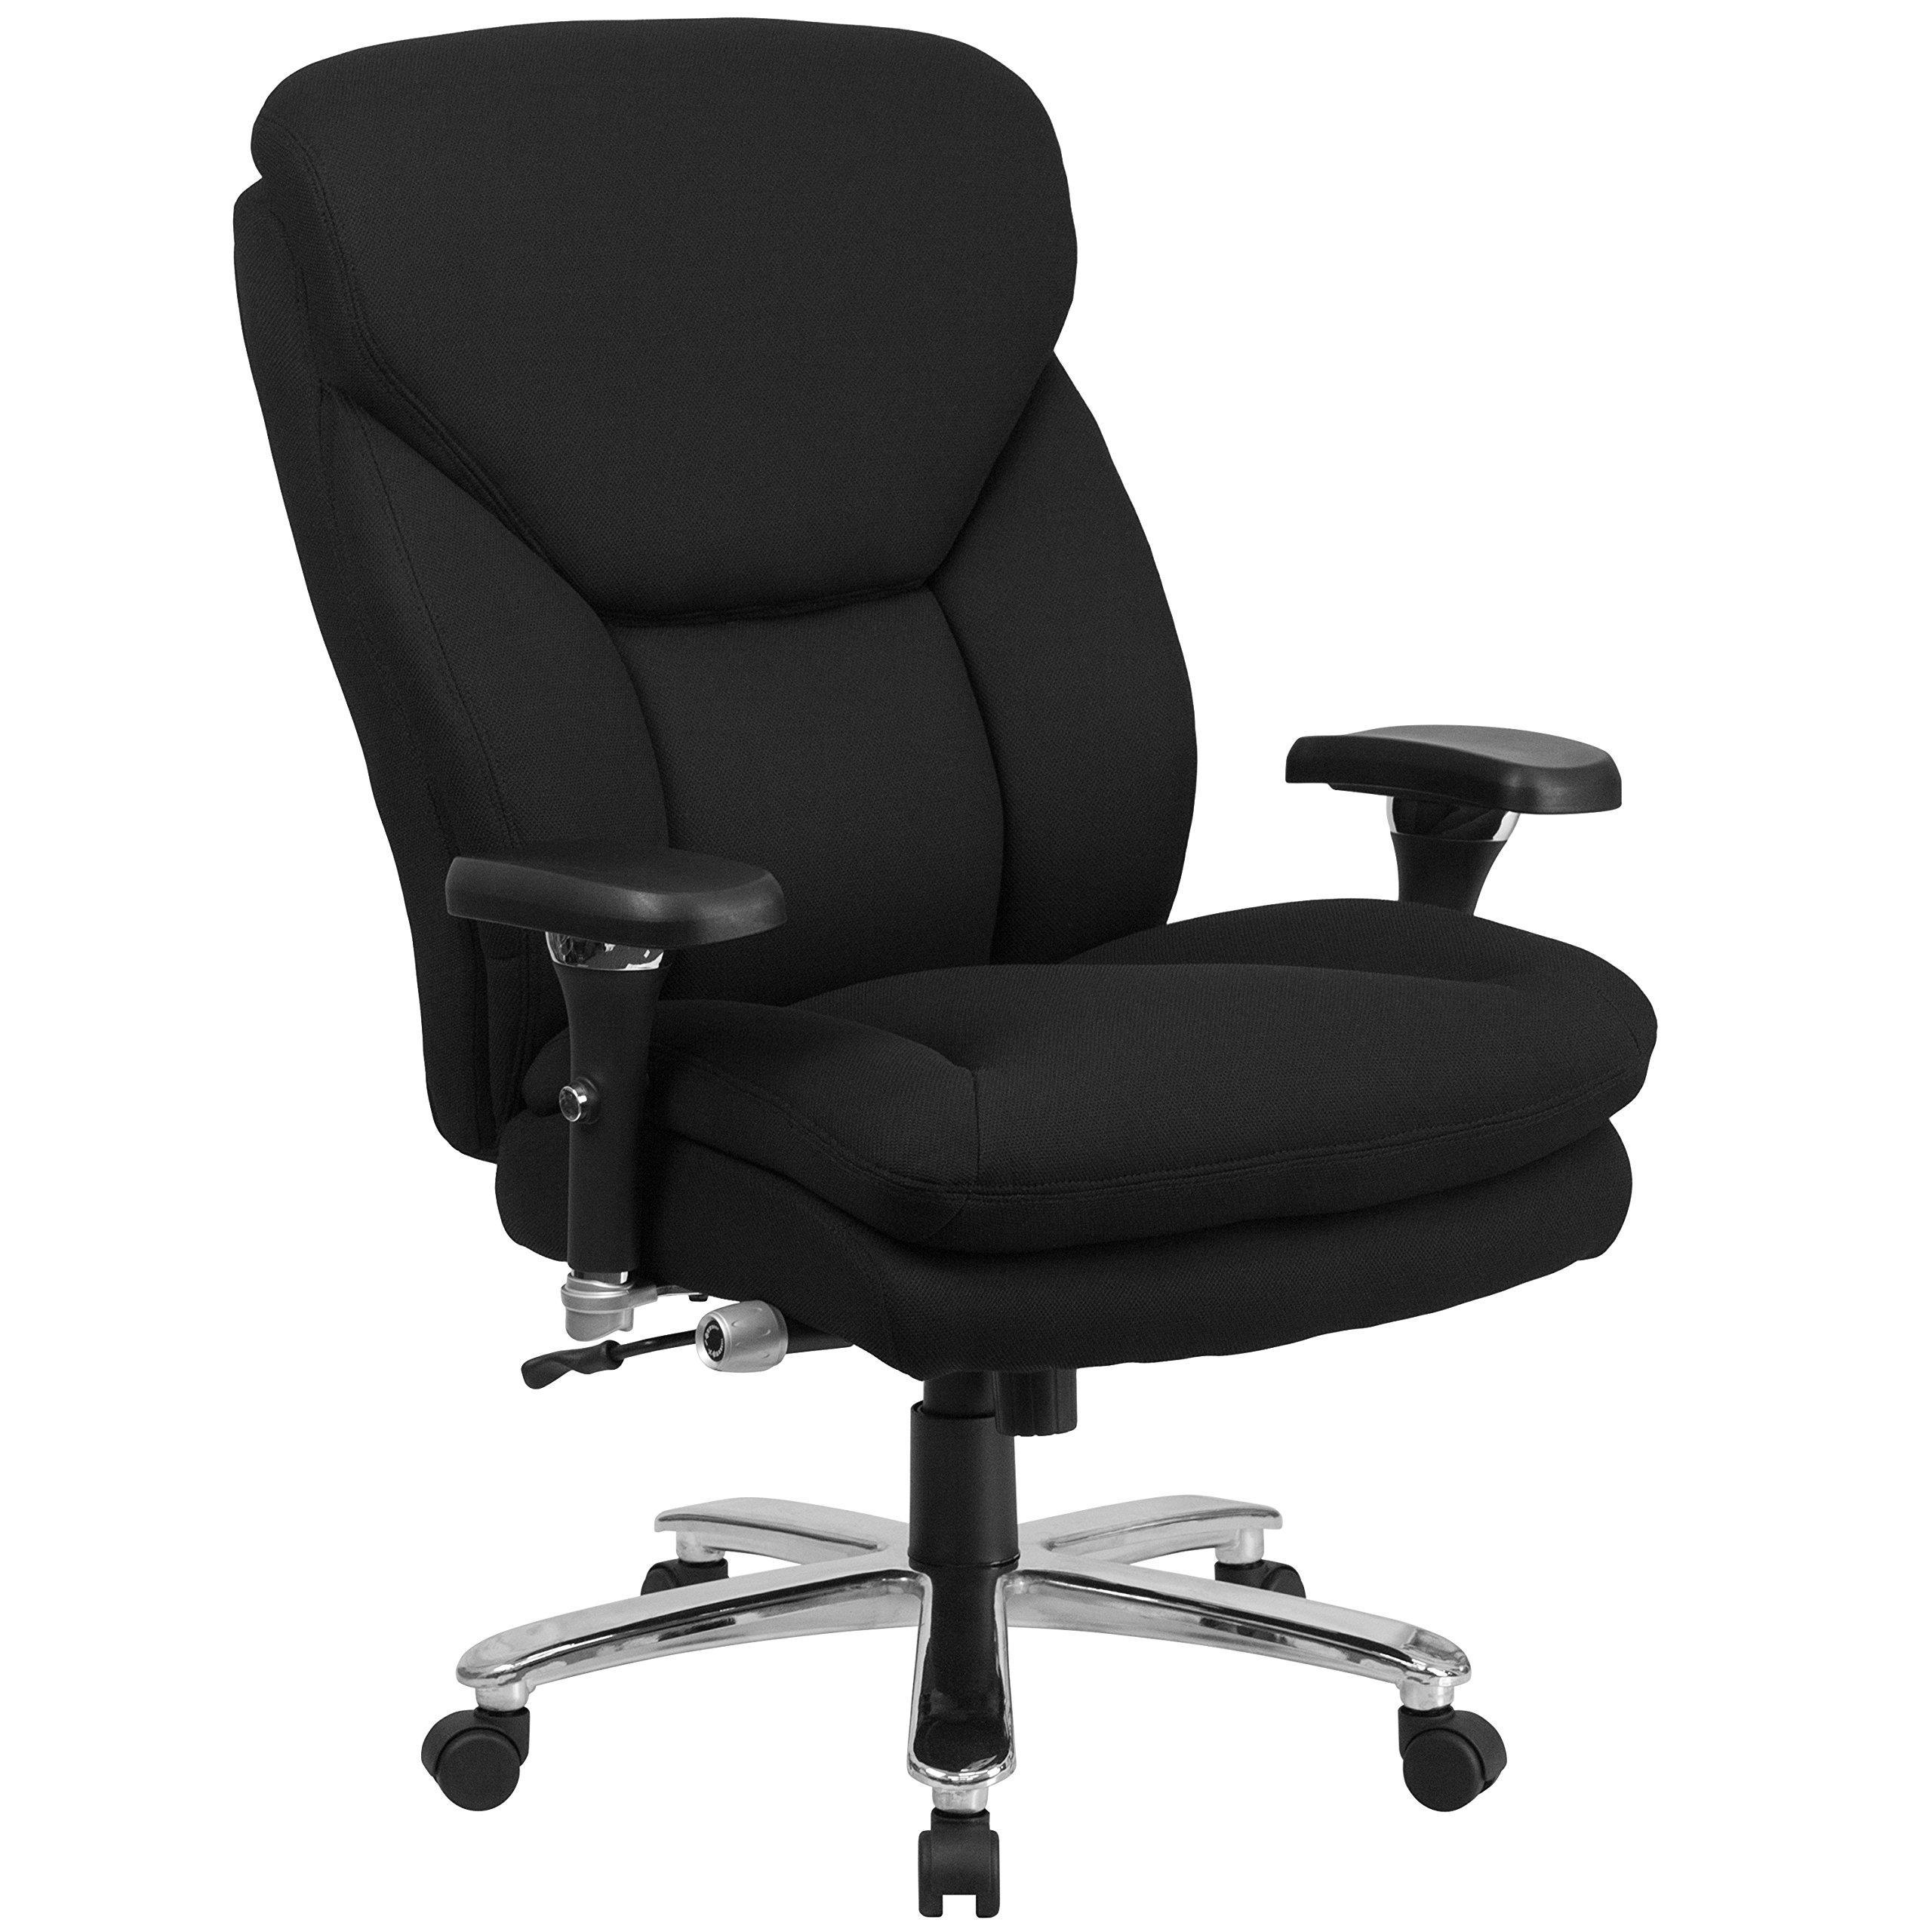 Flash Furniture HERCULES Series 24/7 Intensive Use Big & Tall 400 lb. Rated Black Fabric Executive Swivel Chair with Lumbar Knob by Flash Furniture